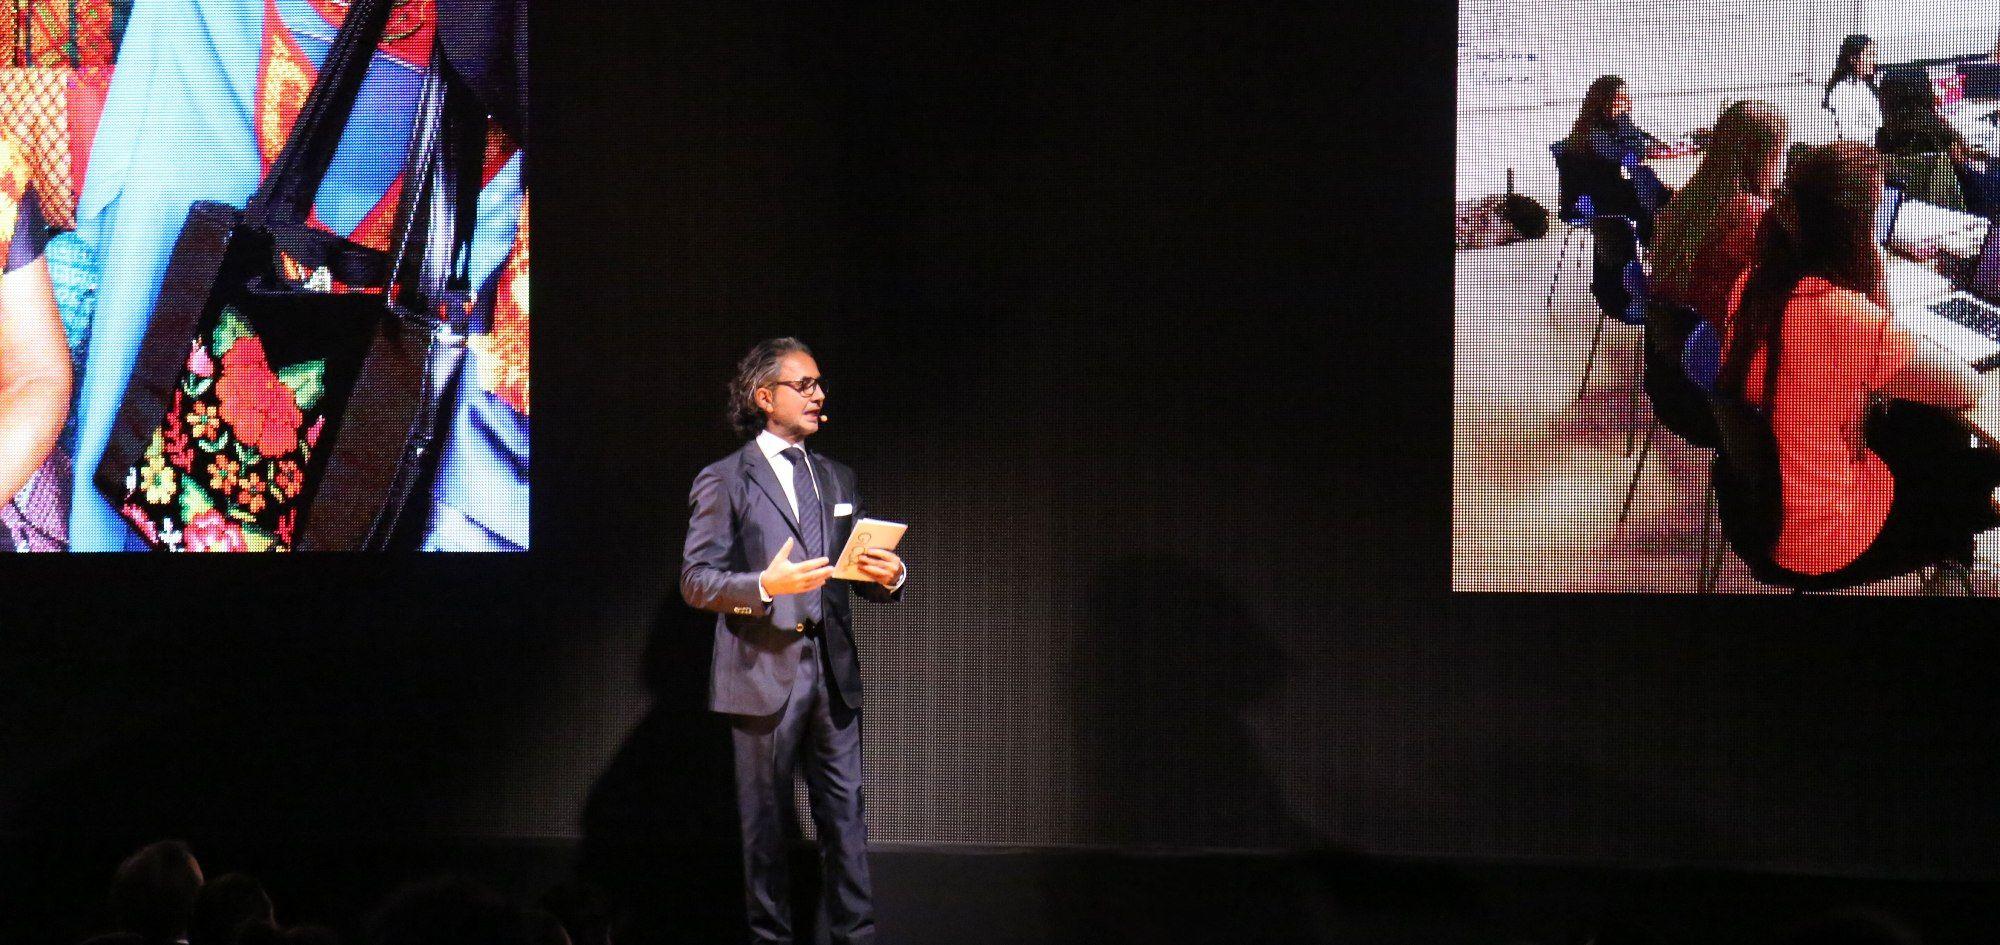 Presenta GICSA su Malltertaiment 'Explanada: Vive de todo'